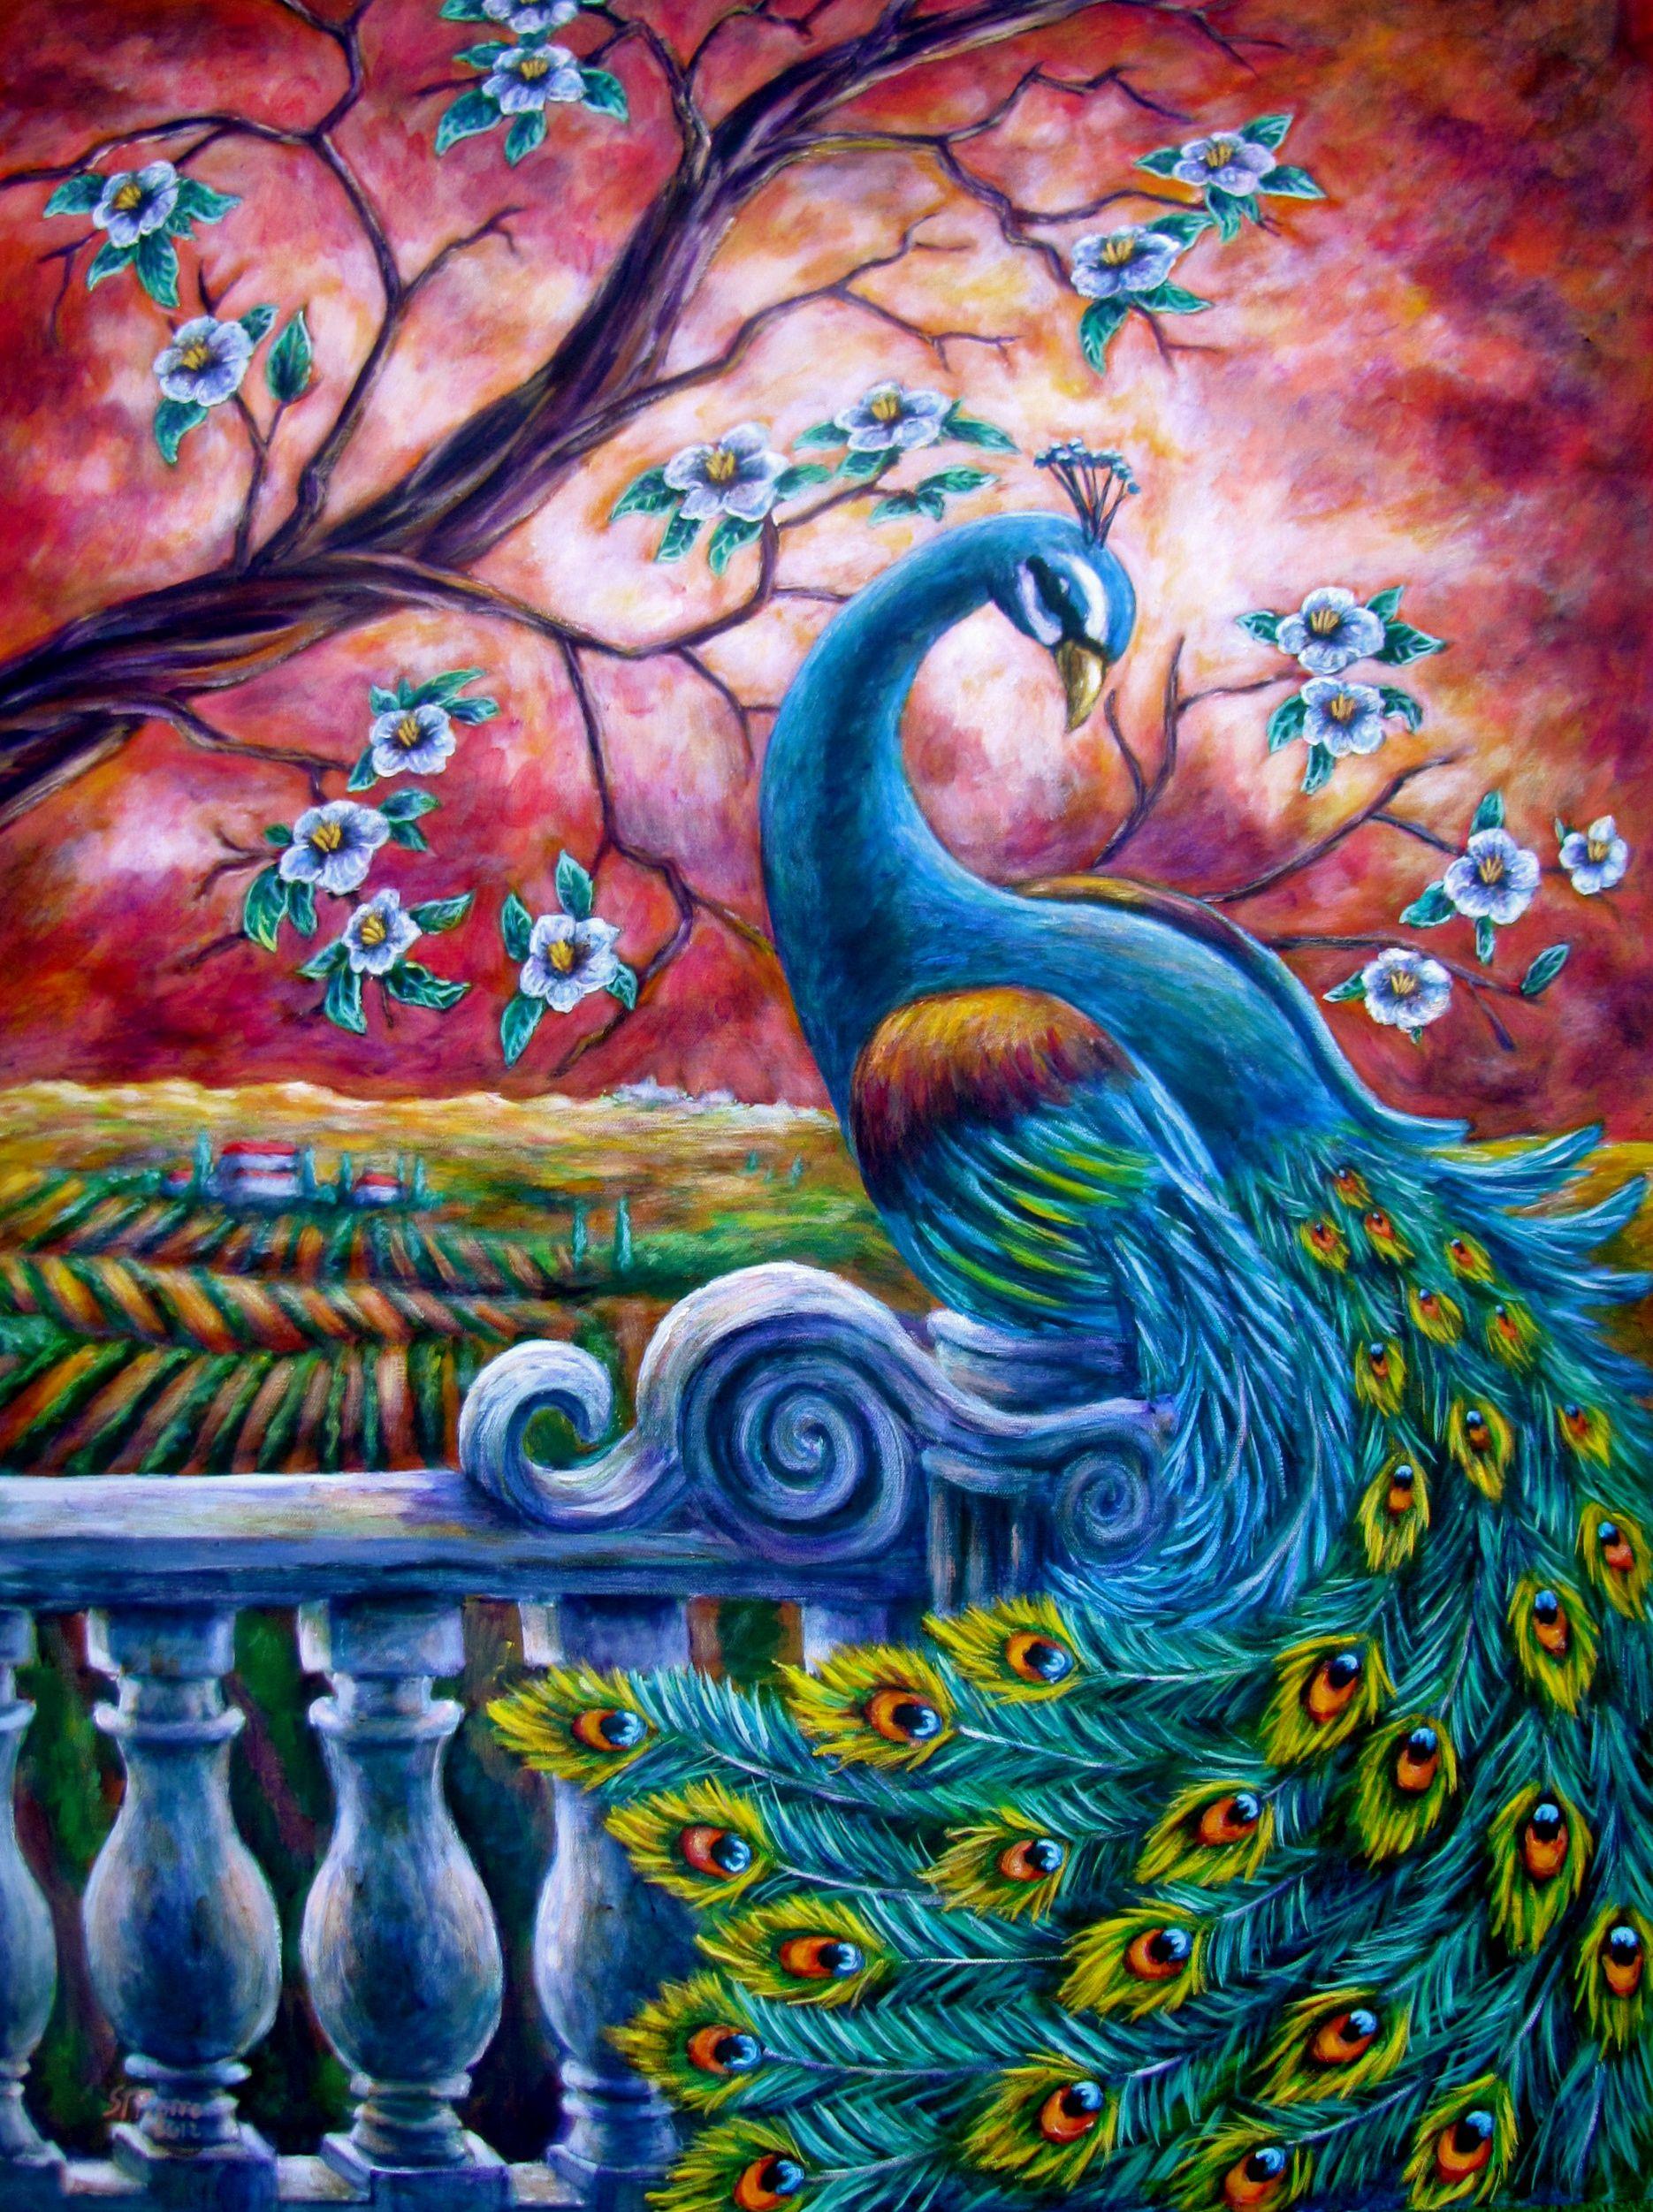 Peacock acrylic paintings - photo#51